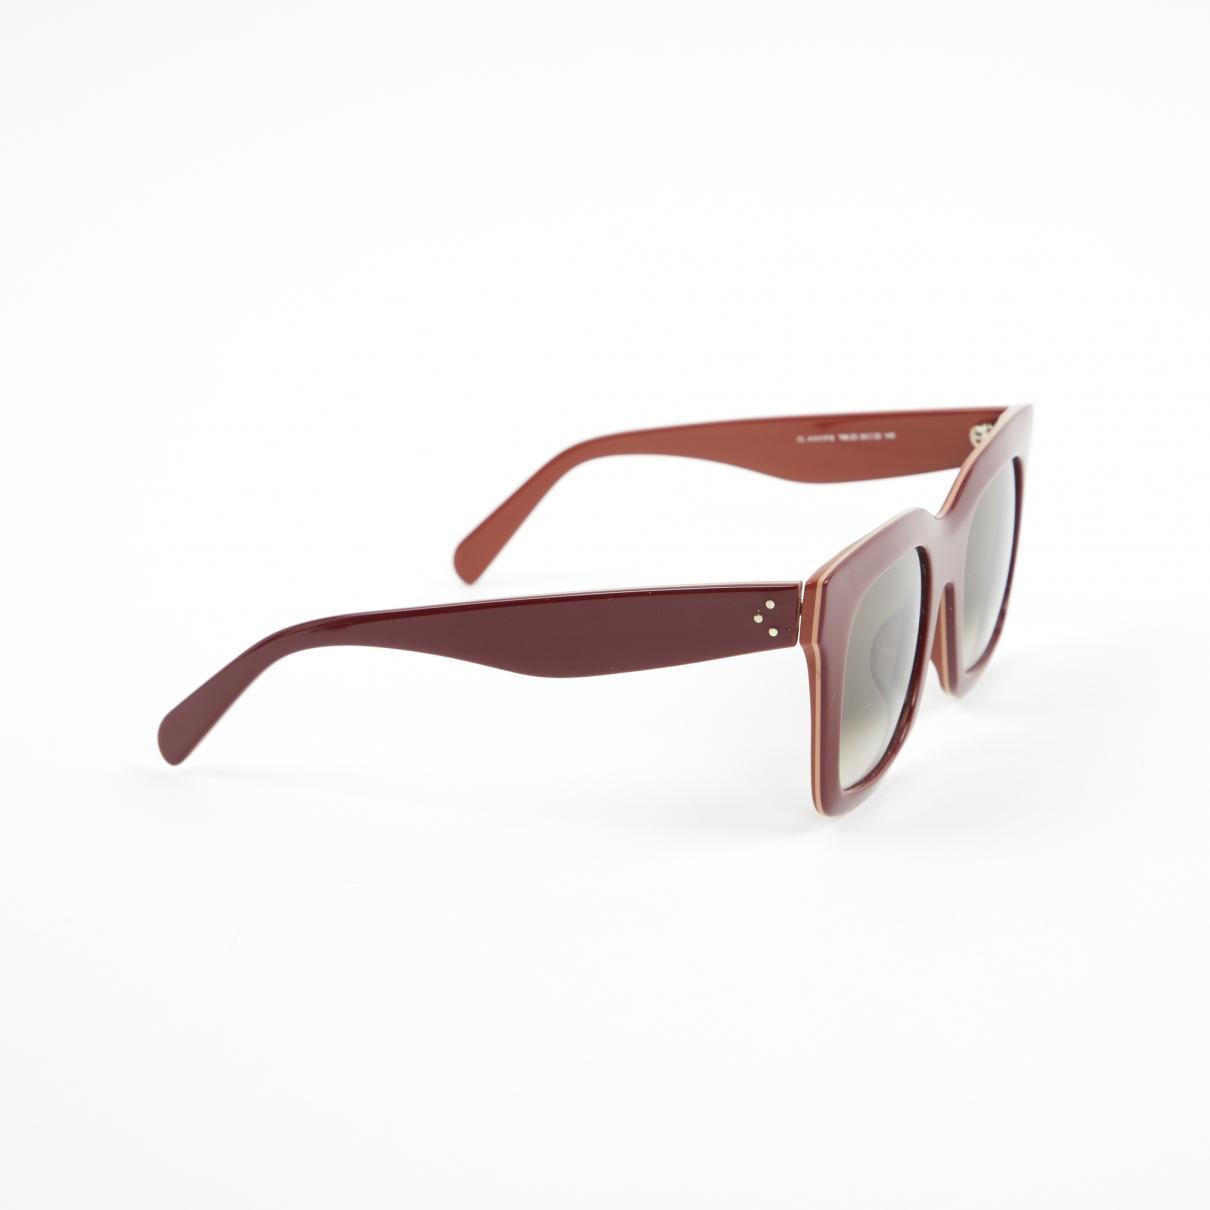 787c53032ecec ... Burgundy Plastic Sunglasses - Lyst. View fullscreen